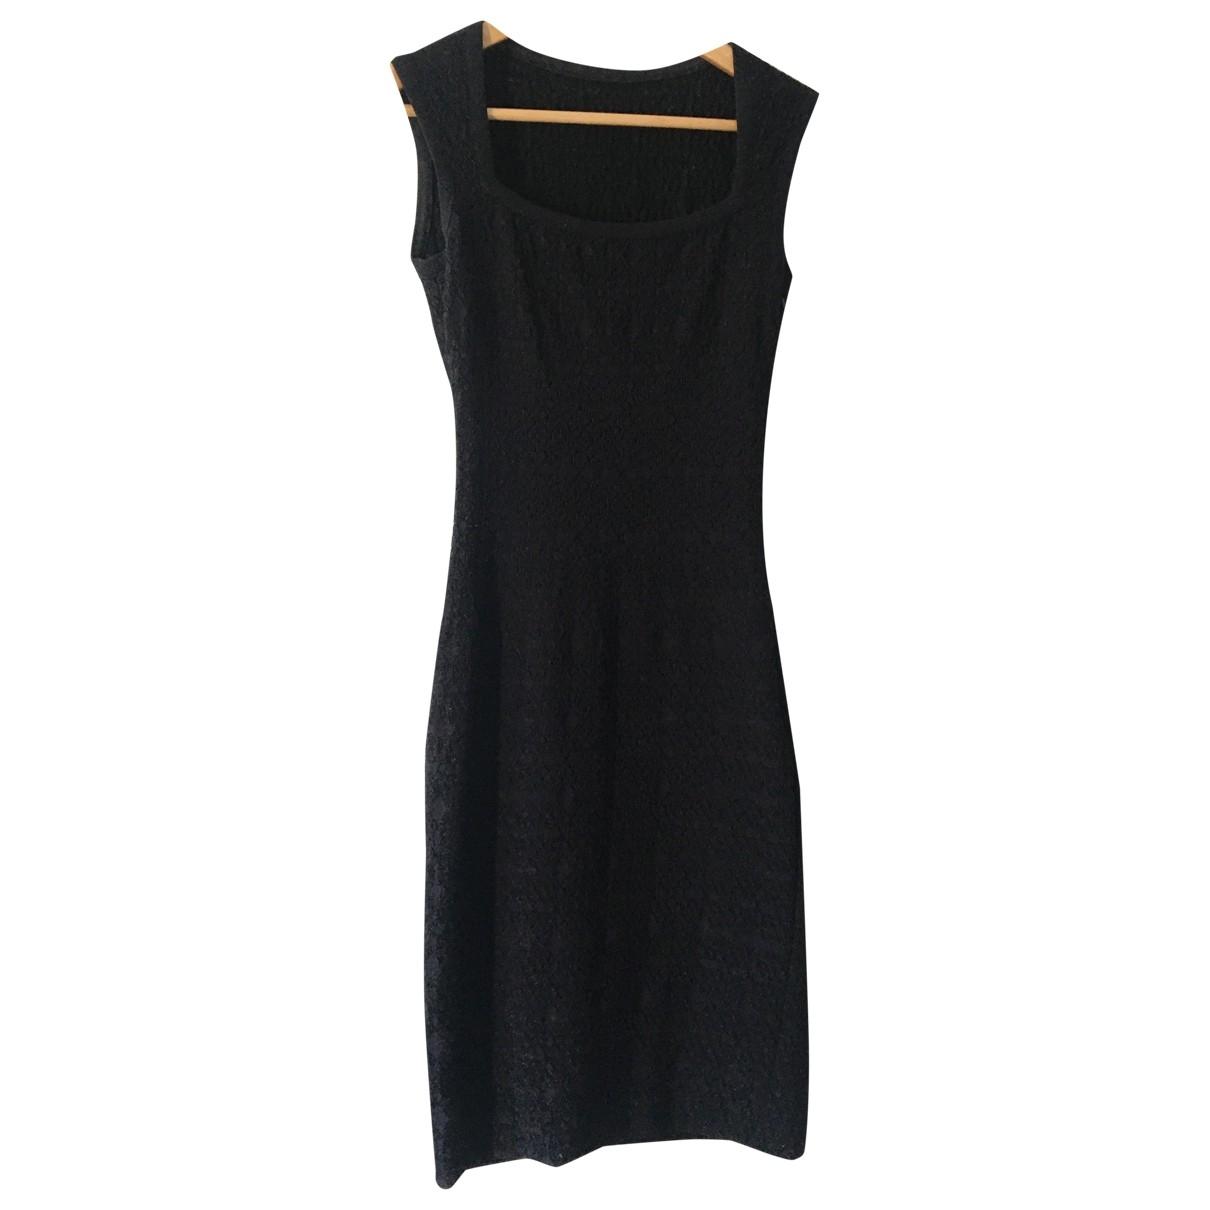 Alaïa \N Black Cotton dress for Women 38 FR